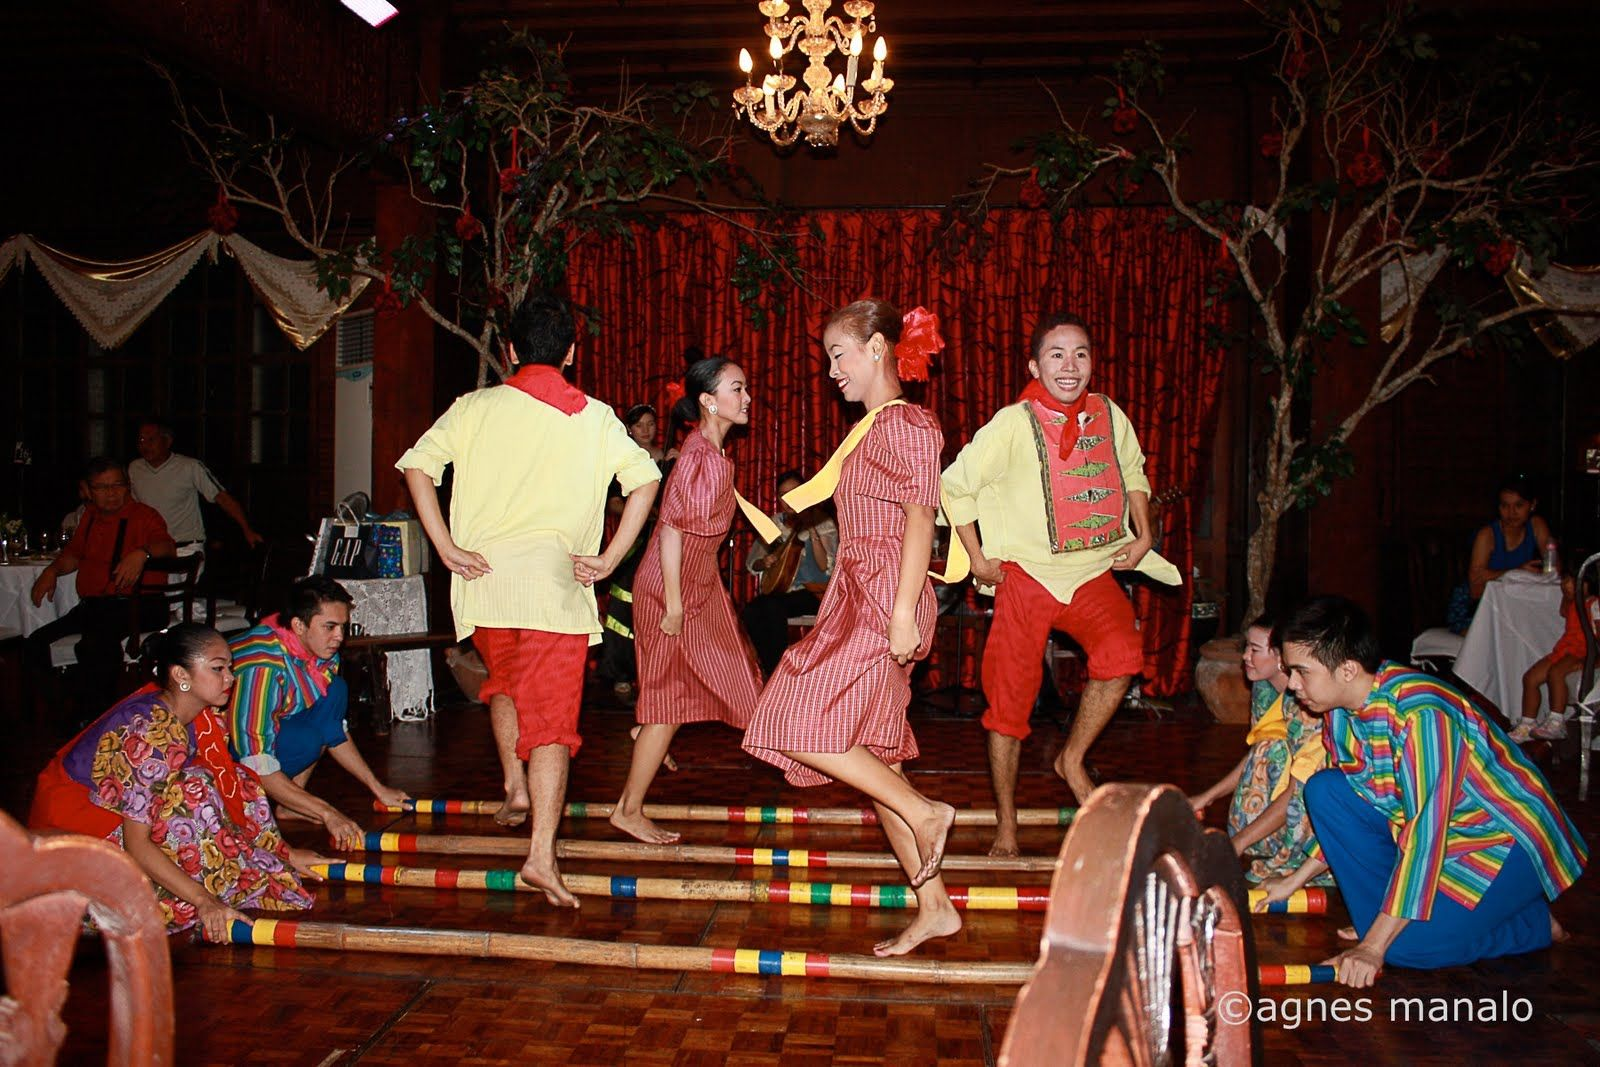 Philippines National dance Tinikling Folk dance, Dance